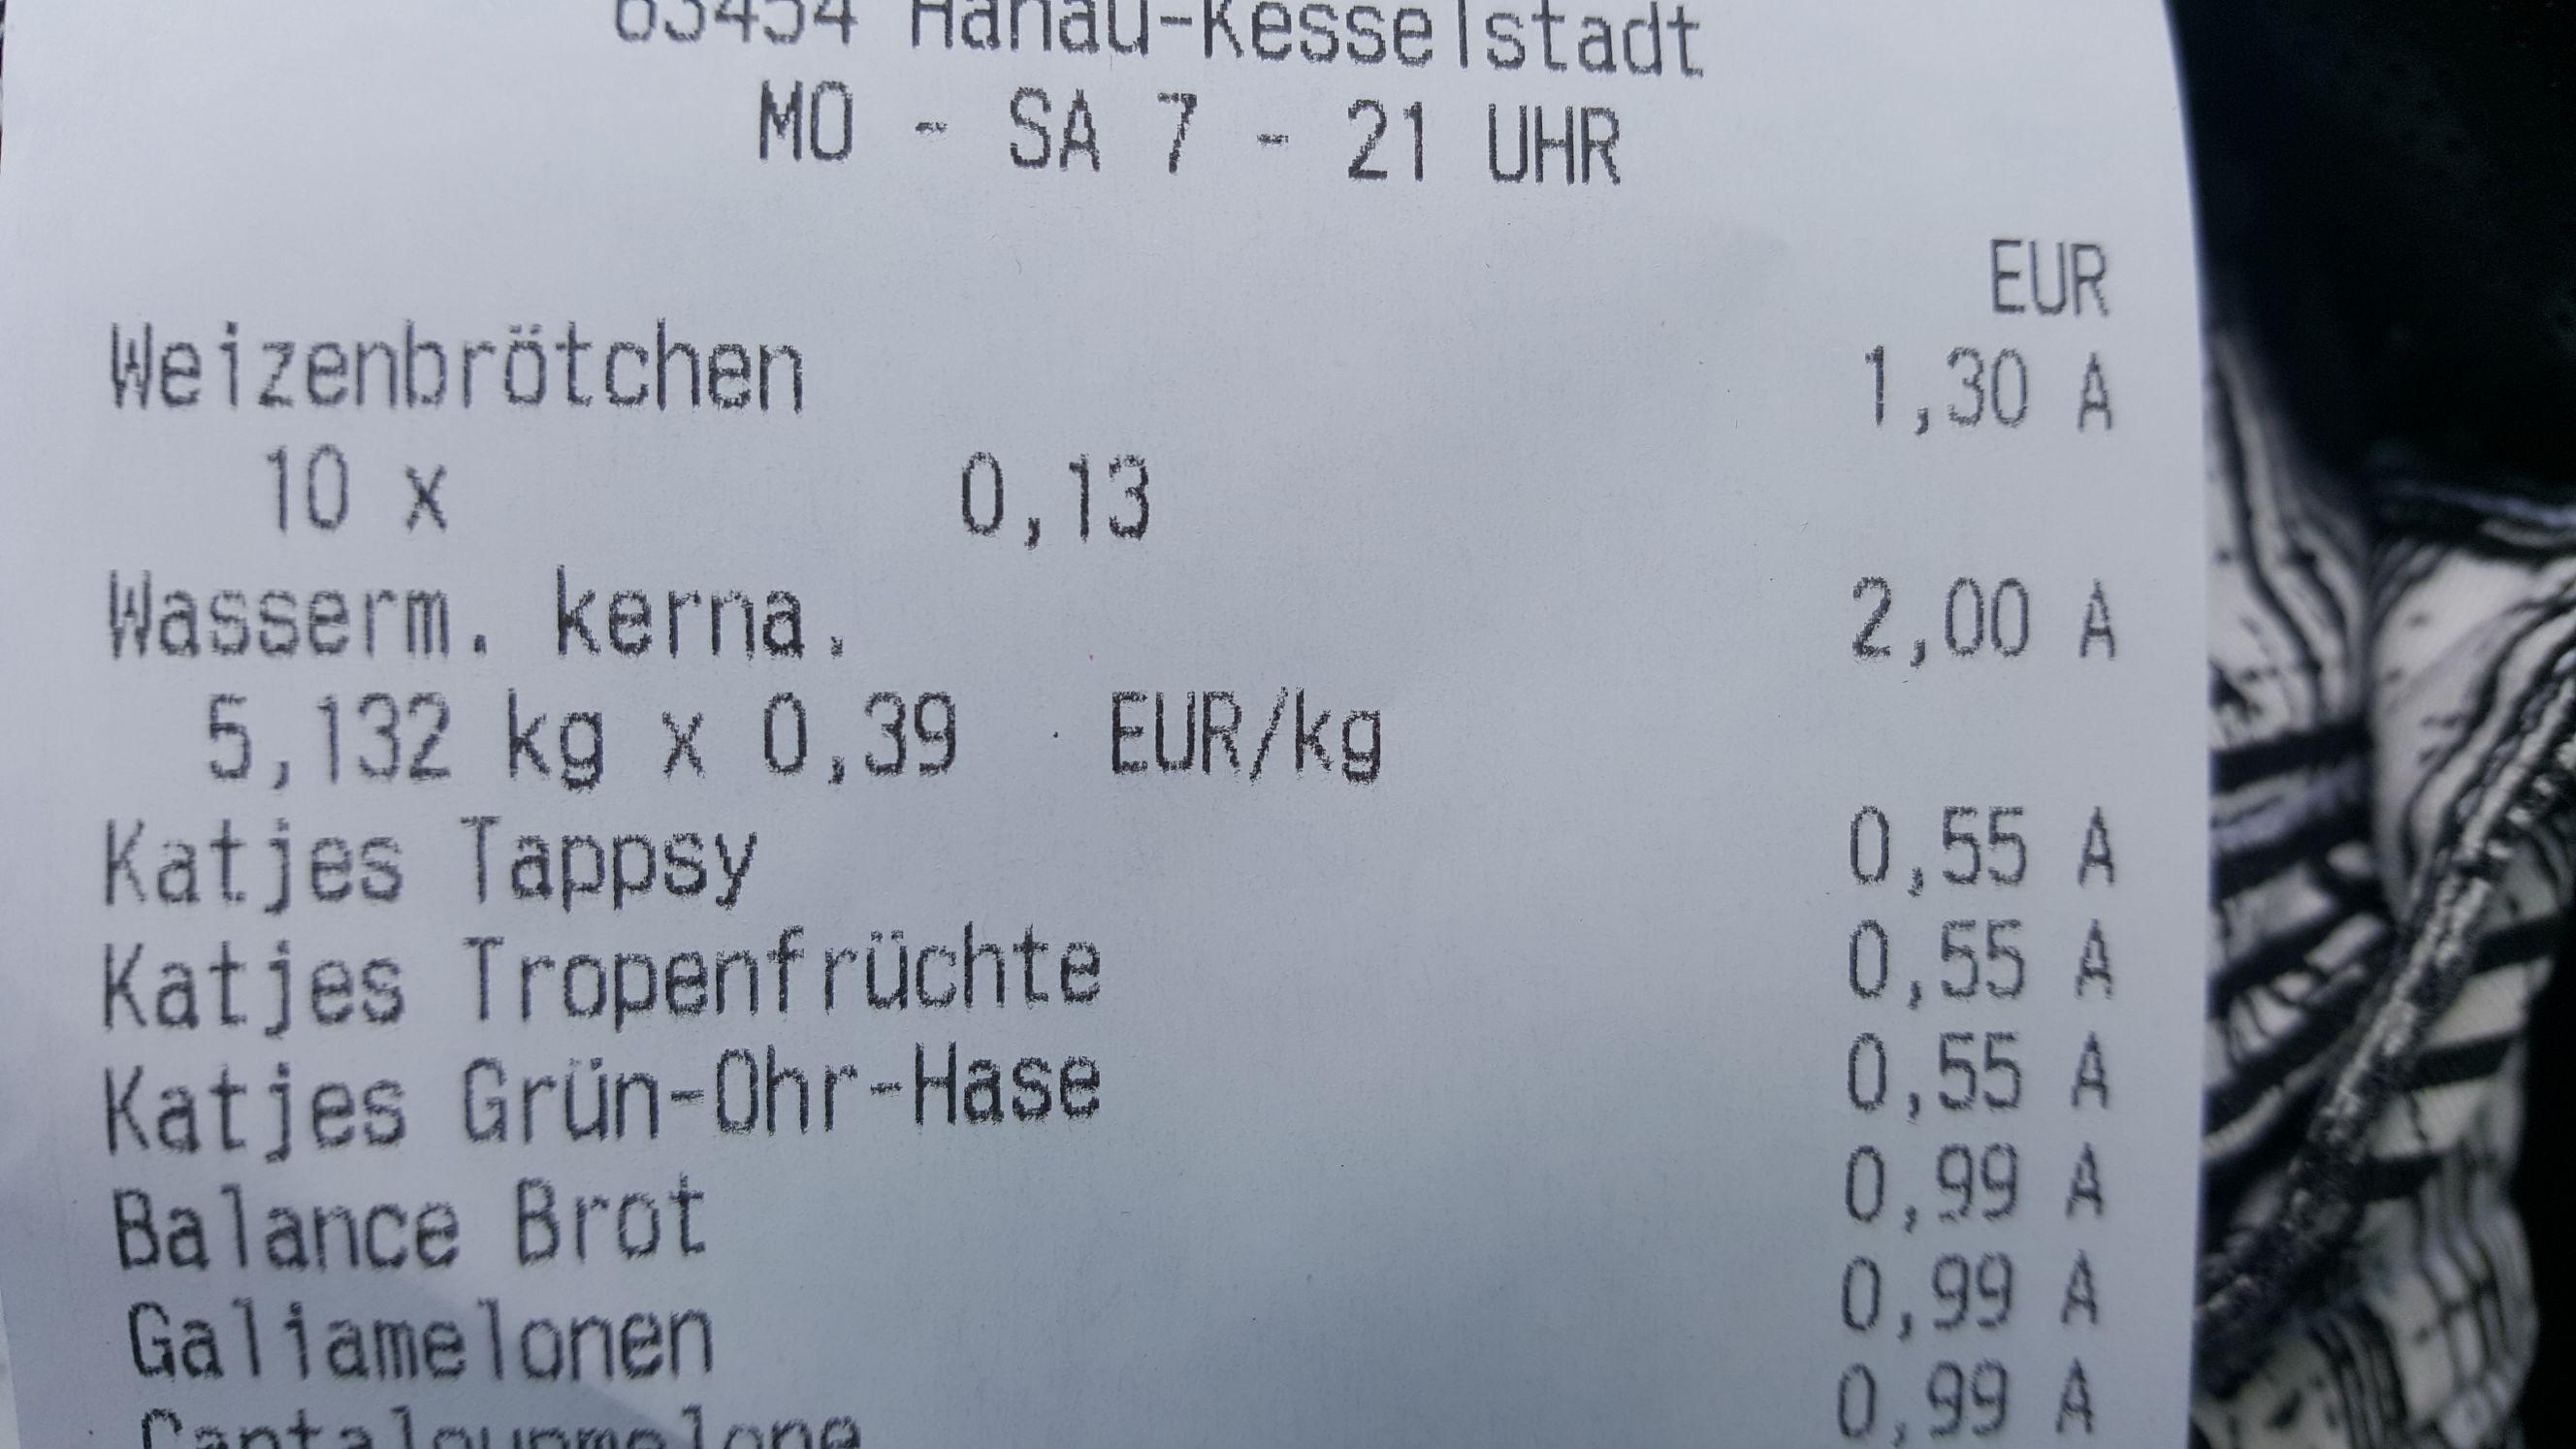 Lidl Super Samstag Bundesweit  (LIDL Wassermelonen Kernarm 0,39/kg